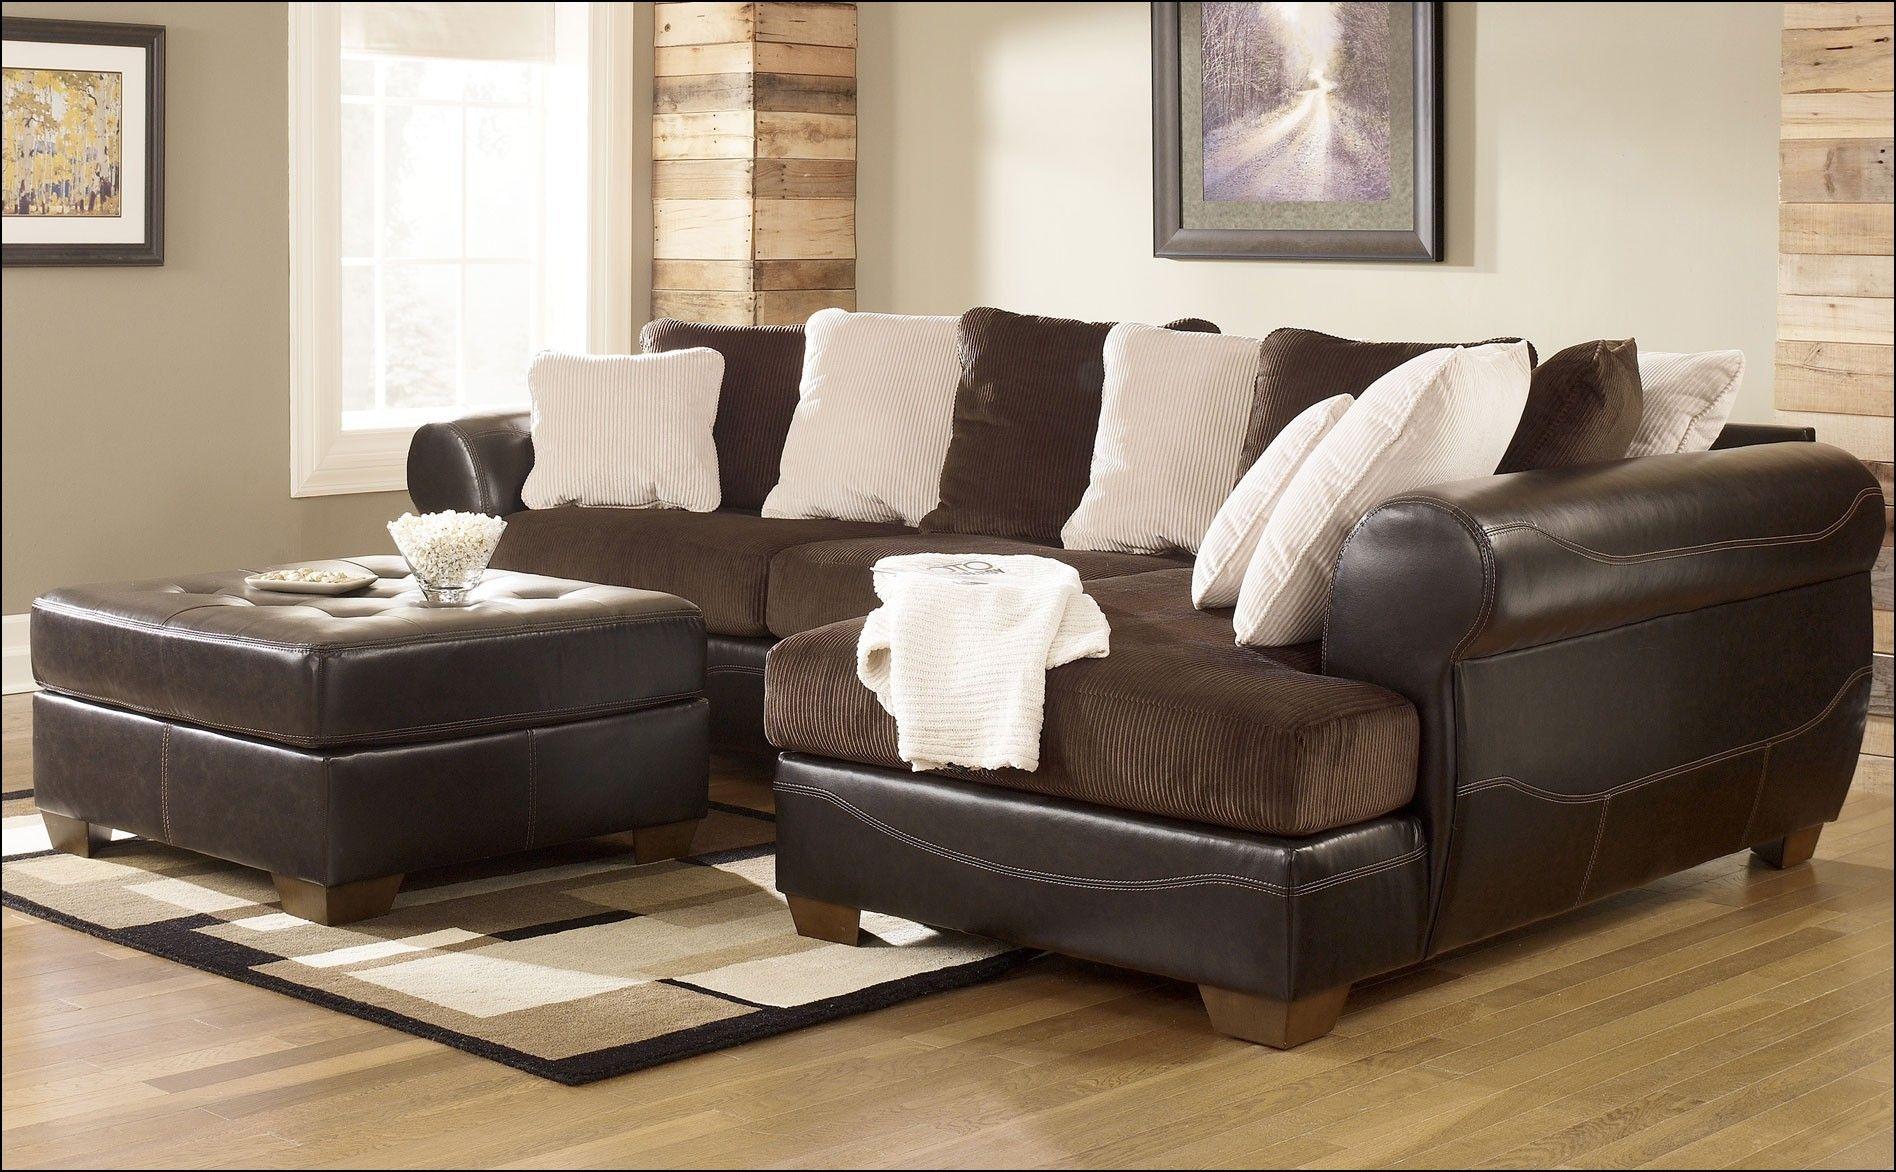 Corduroy sofa ashley Furniture Couch & Sofa Gallery